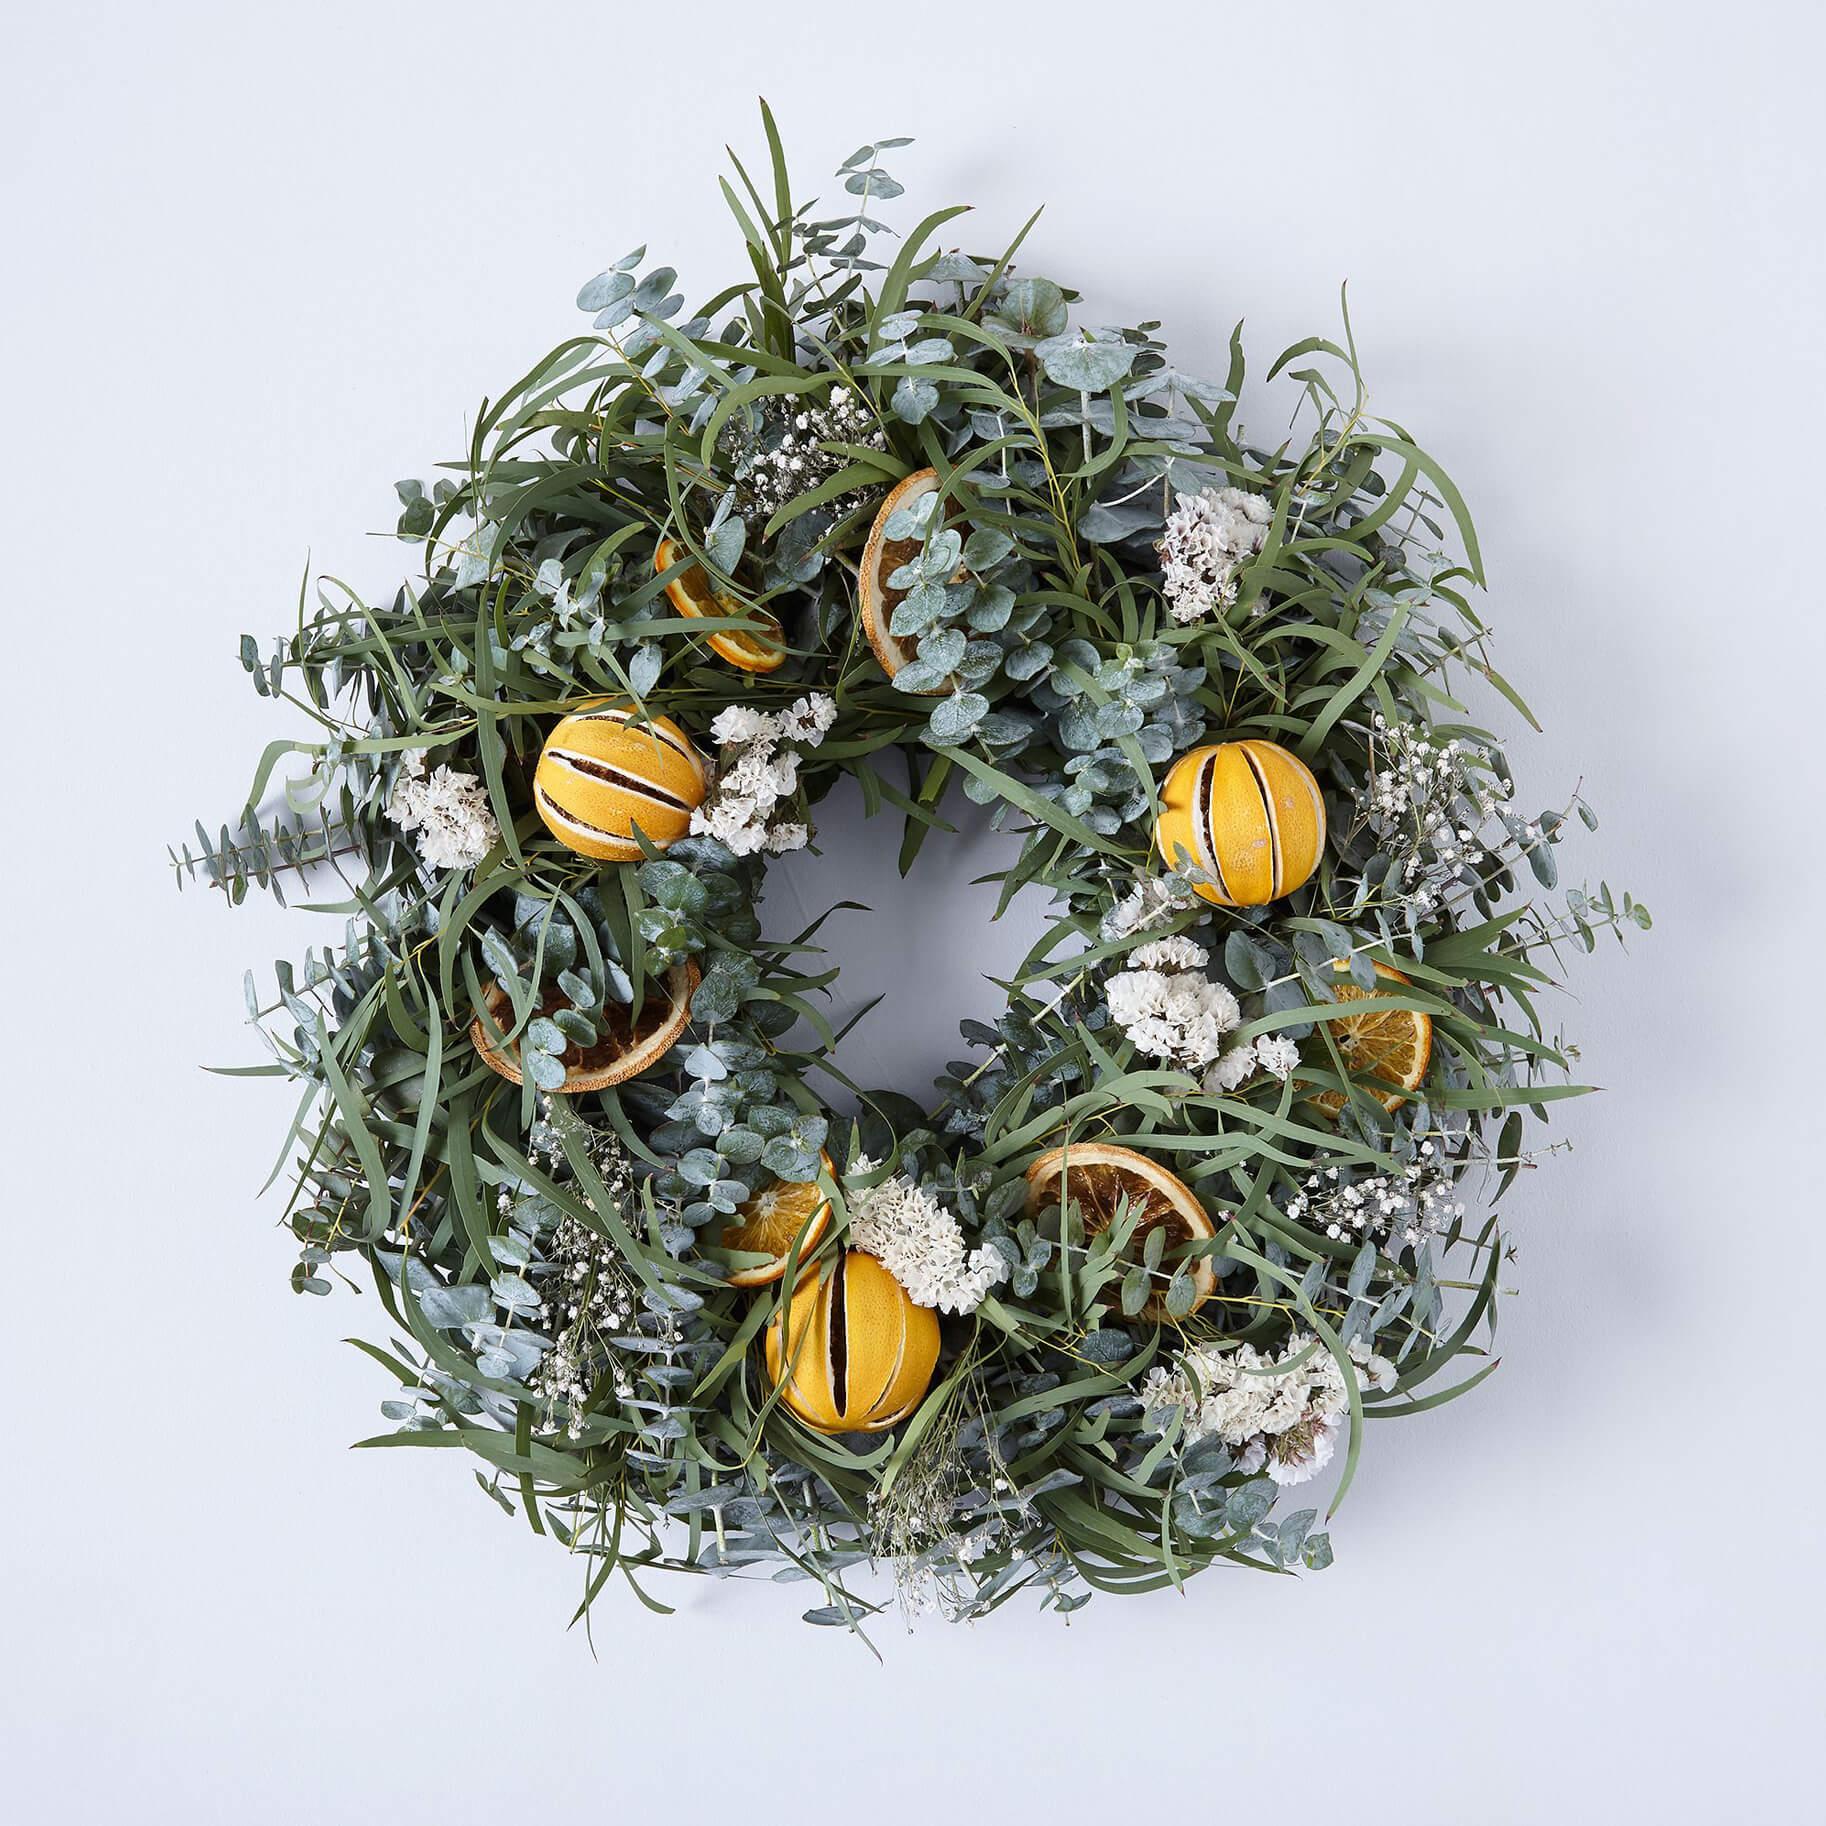 The Best Holiday Wreaths Option: Creekside Farm Citrus Wreath